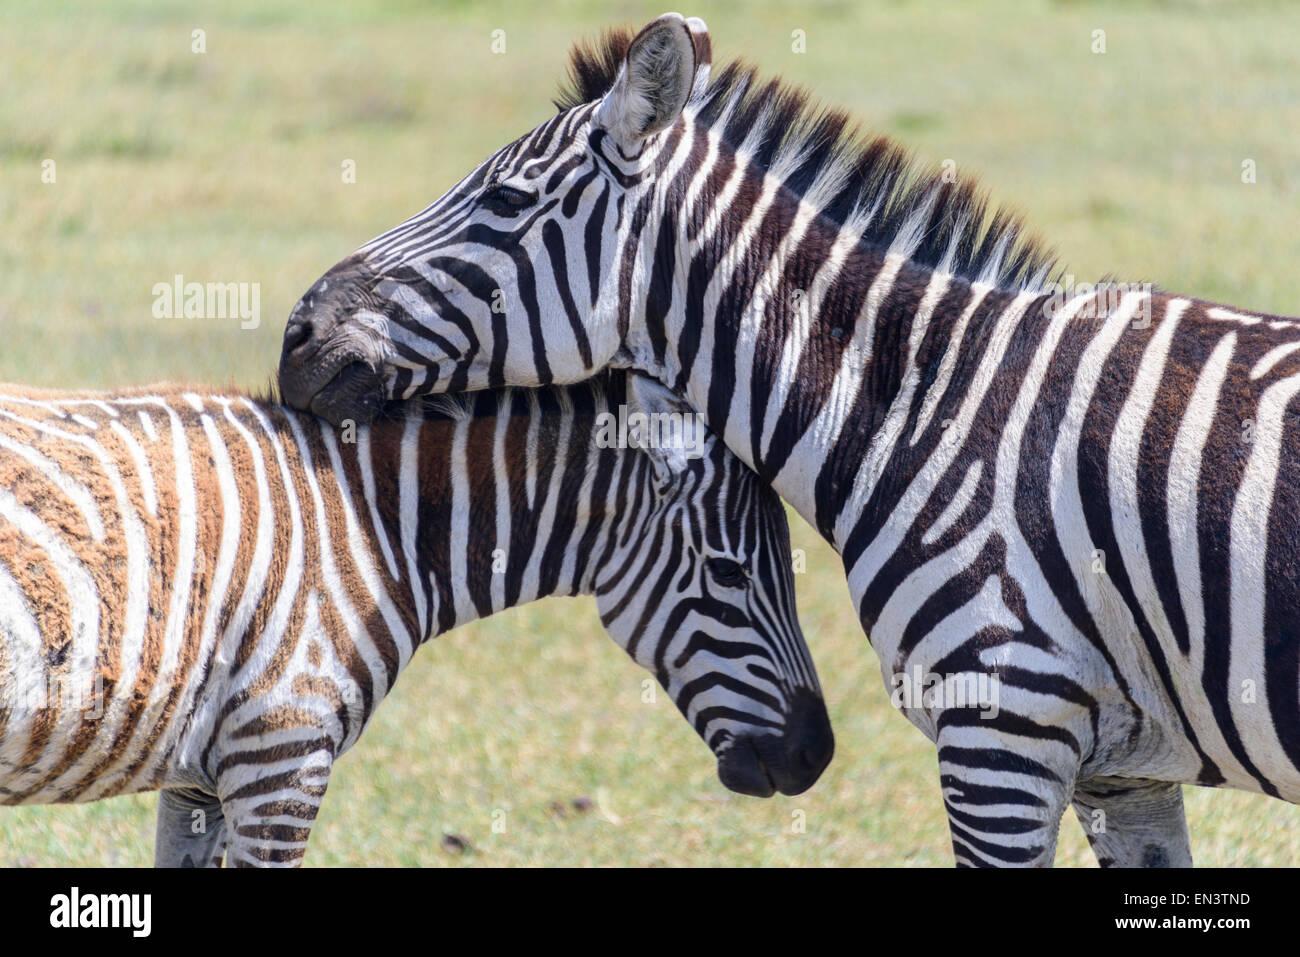 Zebra Equus quagga familia en el Área de Conservación de Ngorongoro, Tanzania, África. Imagen De Stock